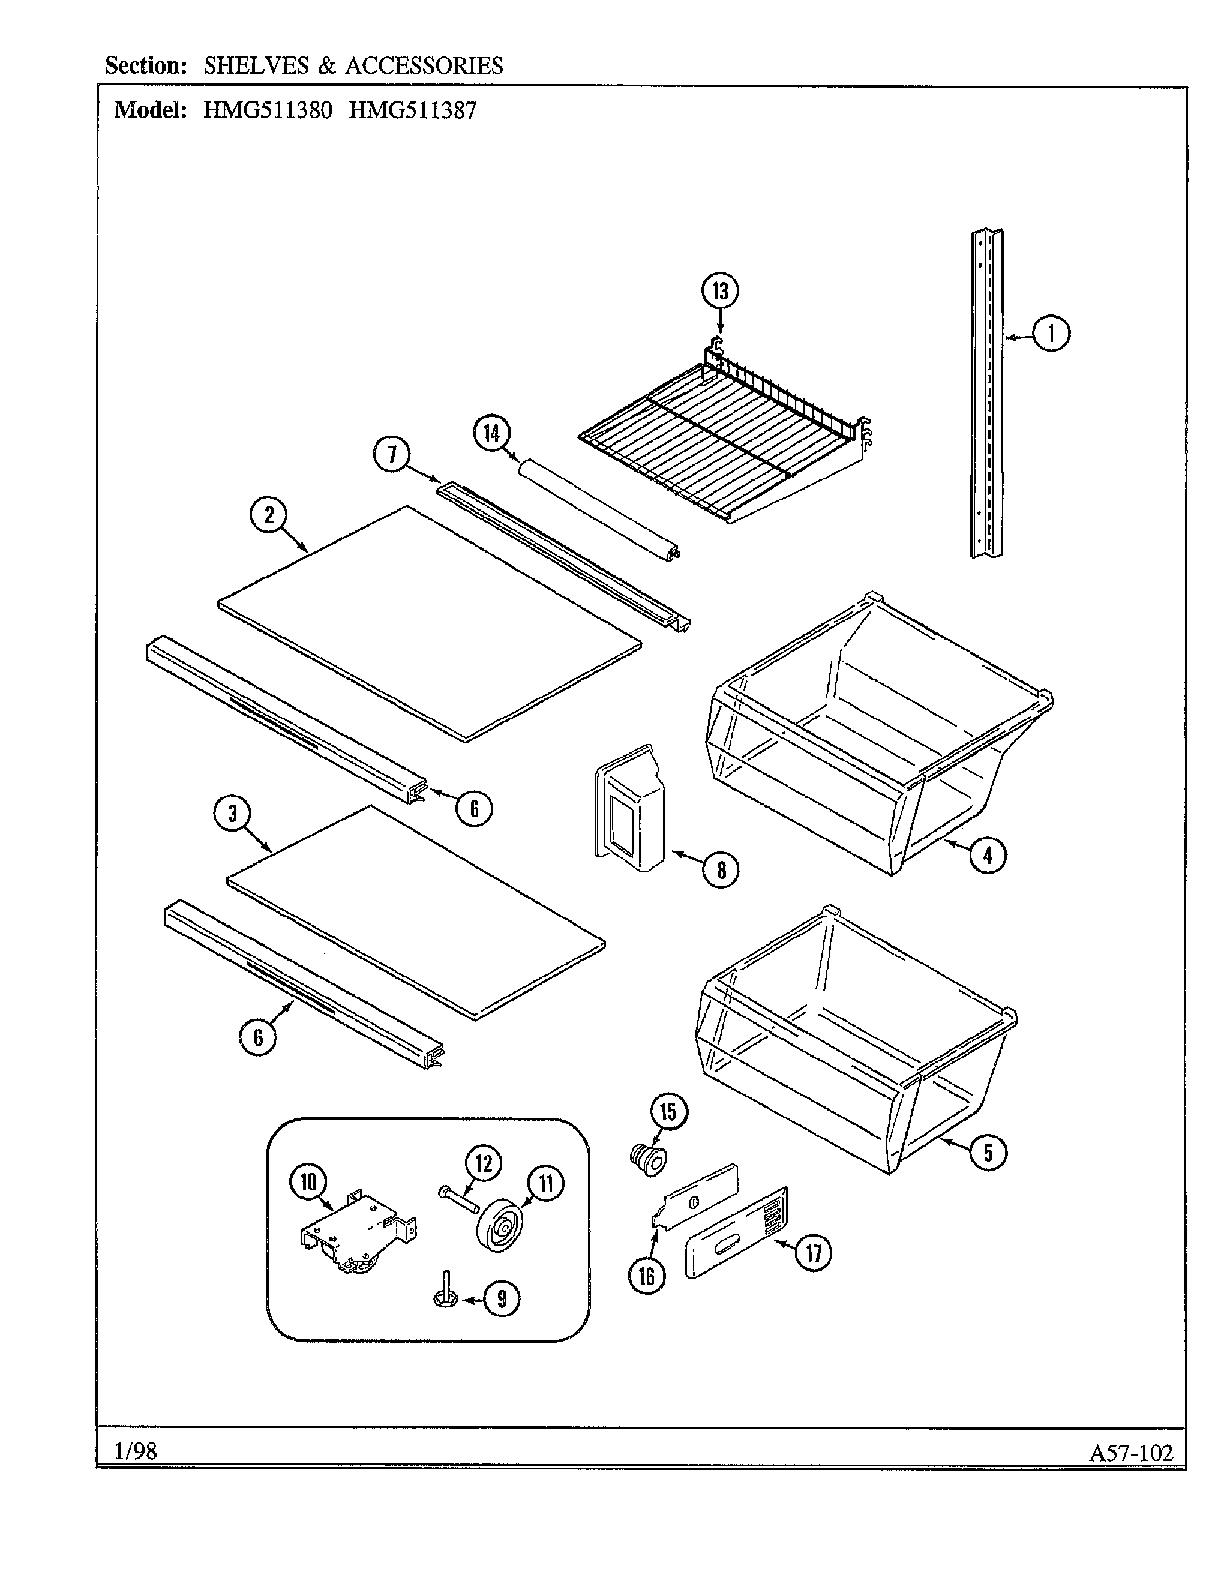 Admiral model HMG511380 side-by-side refrigerator genuine